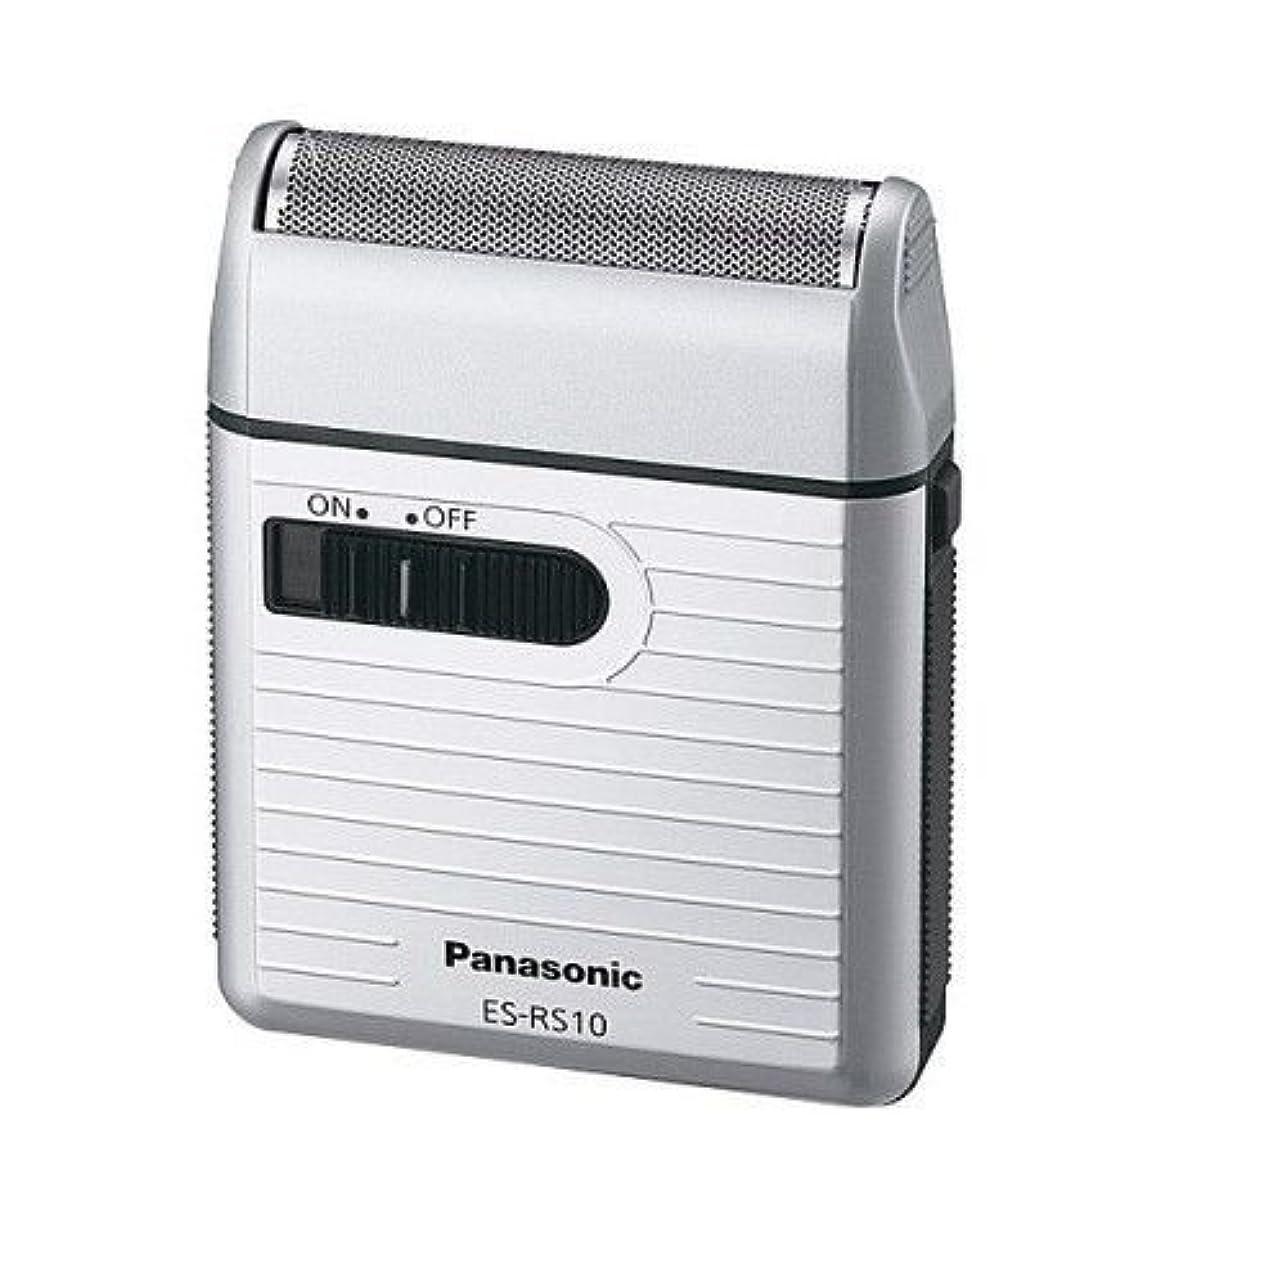 Panasonic ES-RS10-S ンズポケットシェーバーシルバー ESRS10 日本製 [並行輸入品]